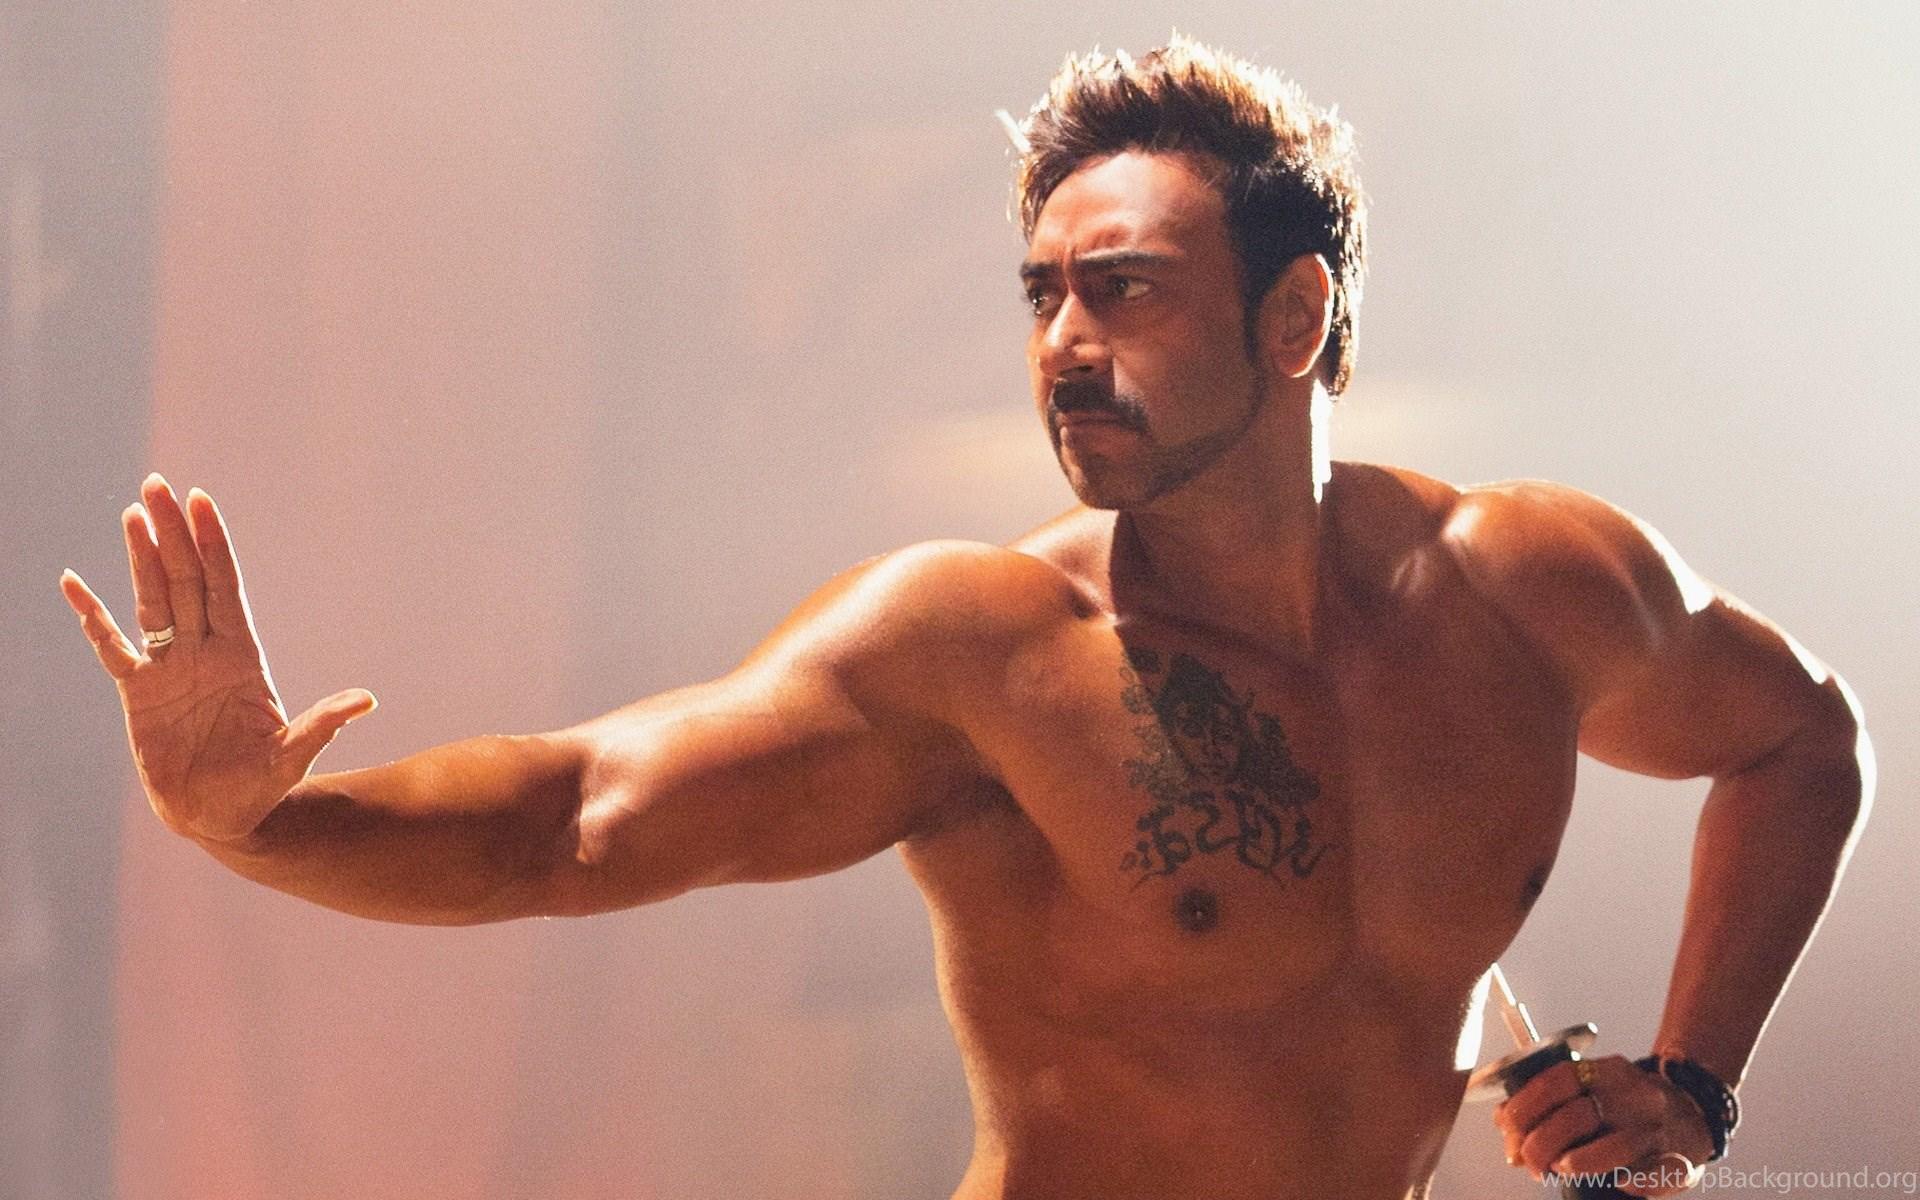 Six pack abs body of ajay devgan bollywood hero desktop background widescreen altavistaventures Images